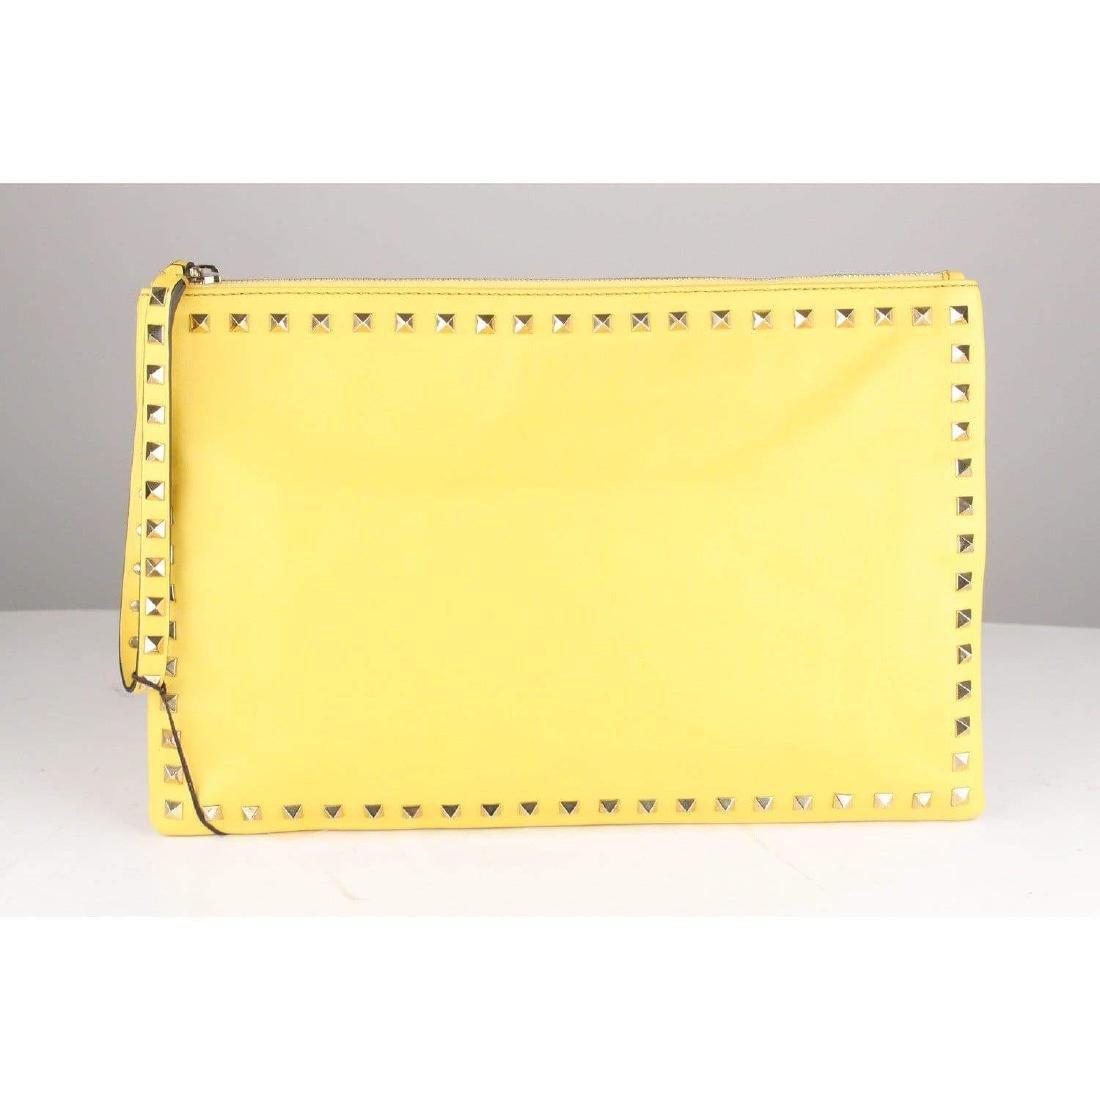 Valentino Rockstud Large Clutch Wrist Bag - 4